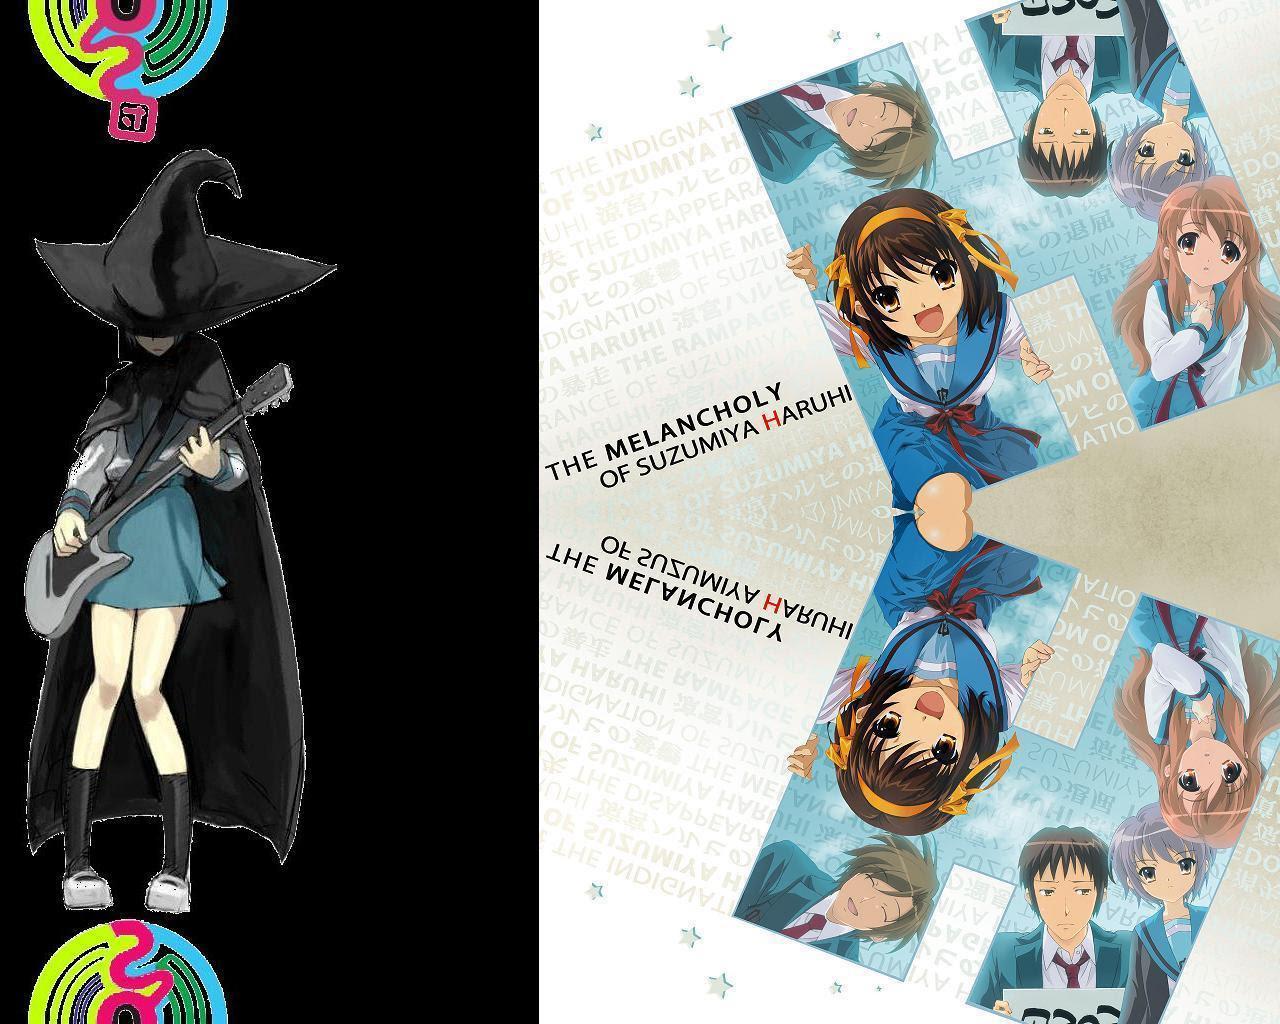 The Melancholy Of Haruhi Suzumiya Wallpaper The Sos Brigade